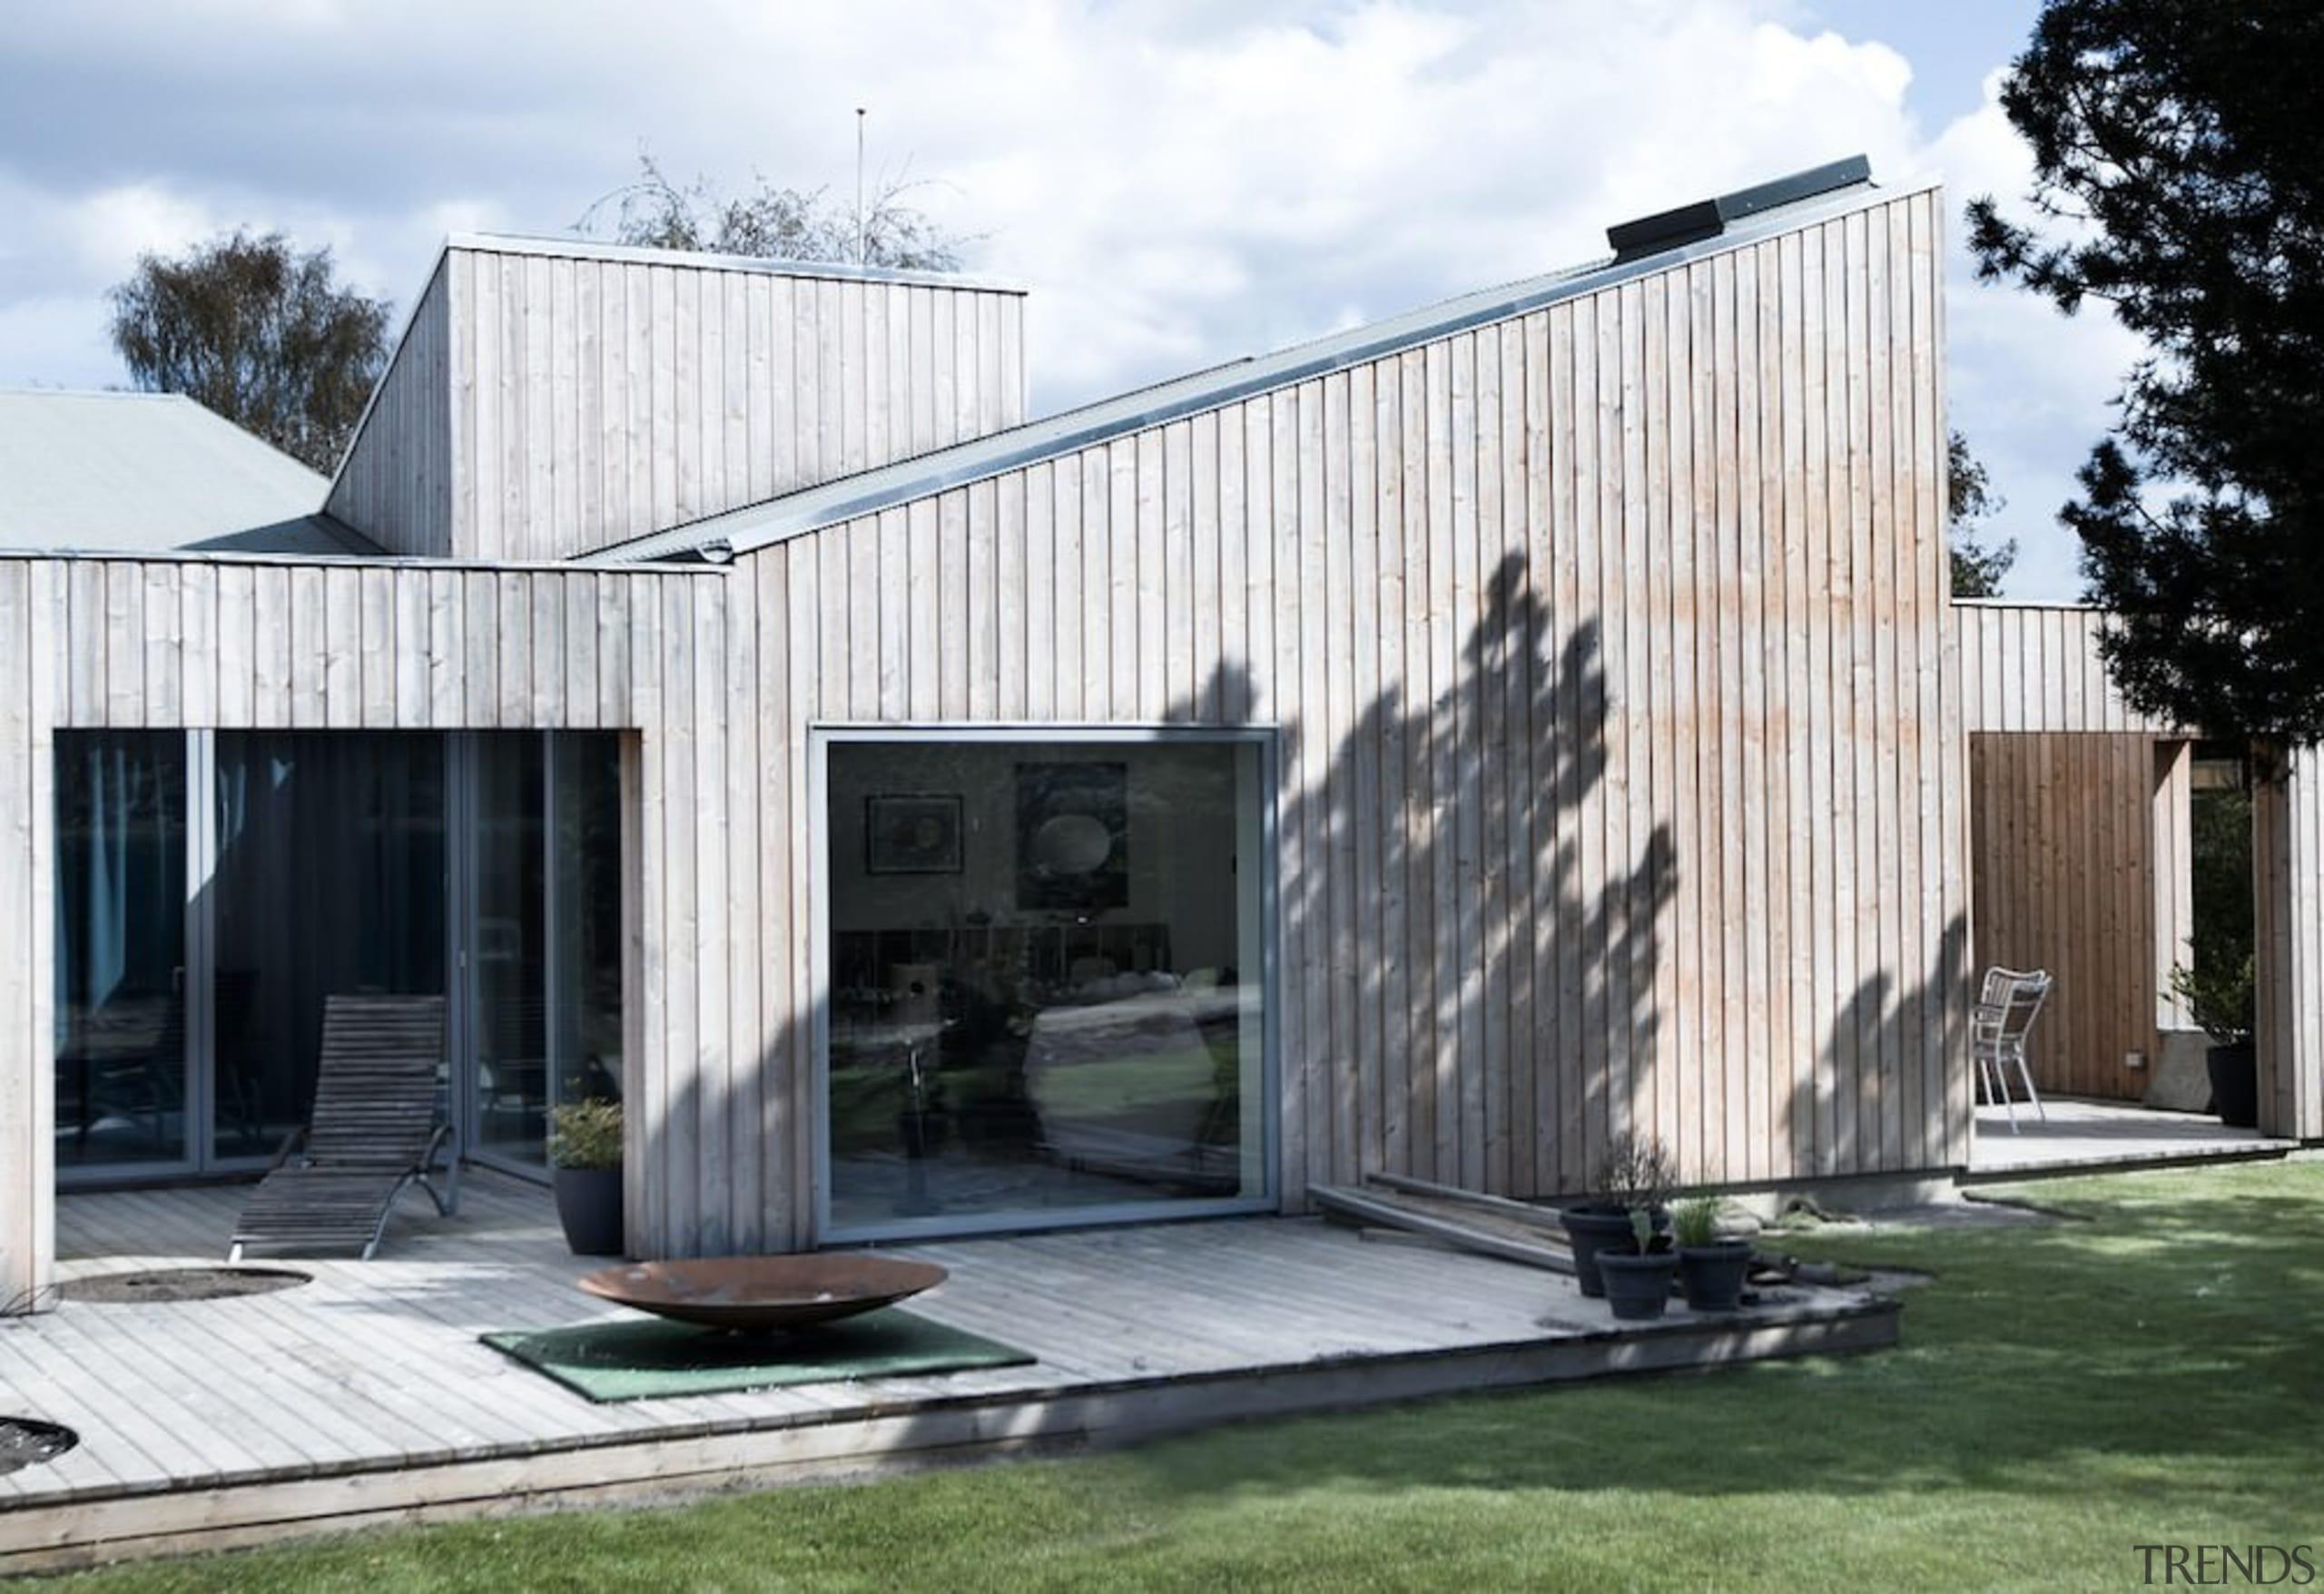 Architect: Sigured LarsenPhotography by Tia Borgsmidt architecture, facade, home, house, siding, white